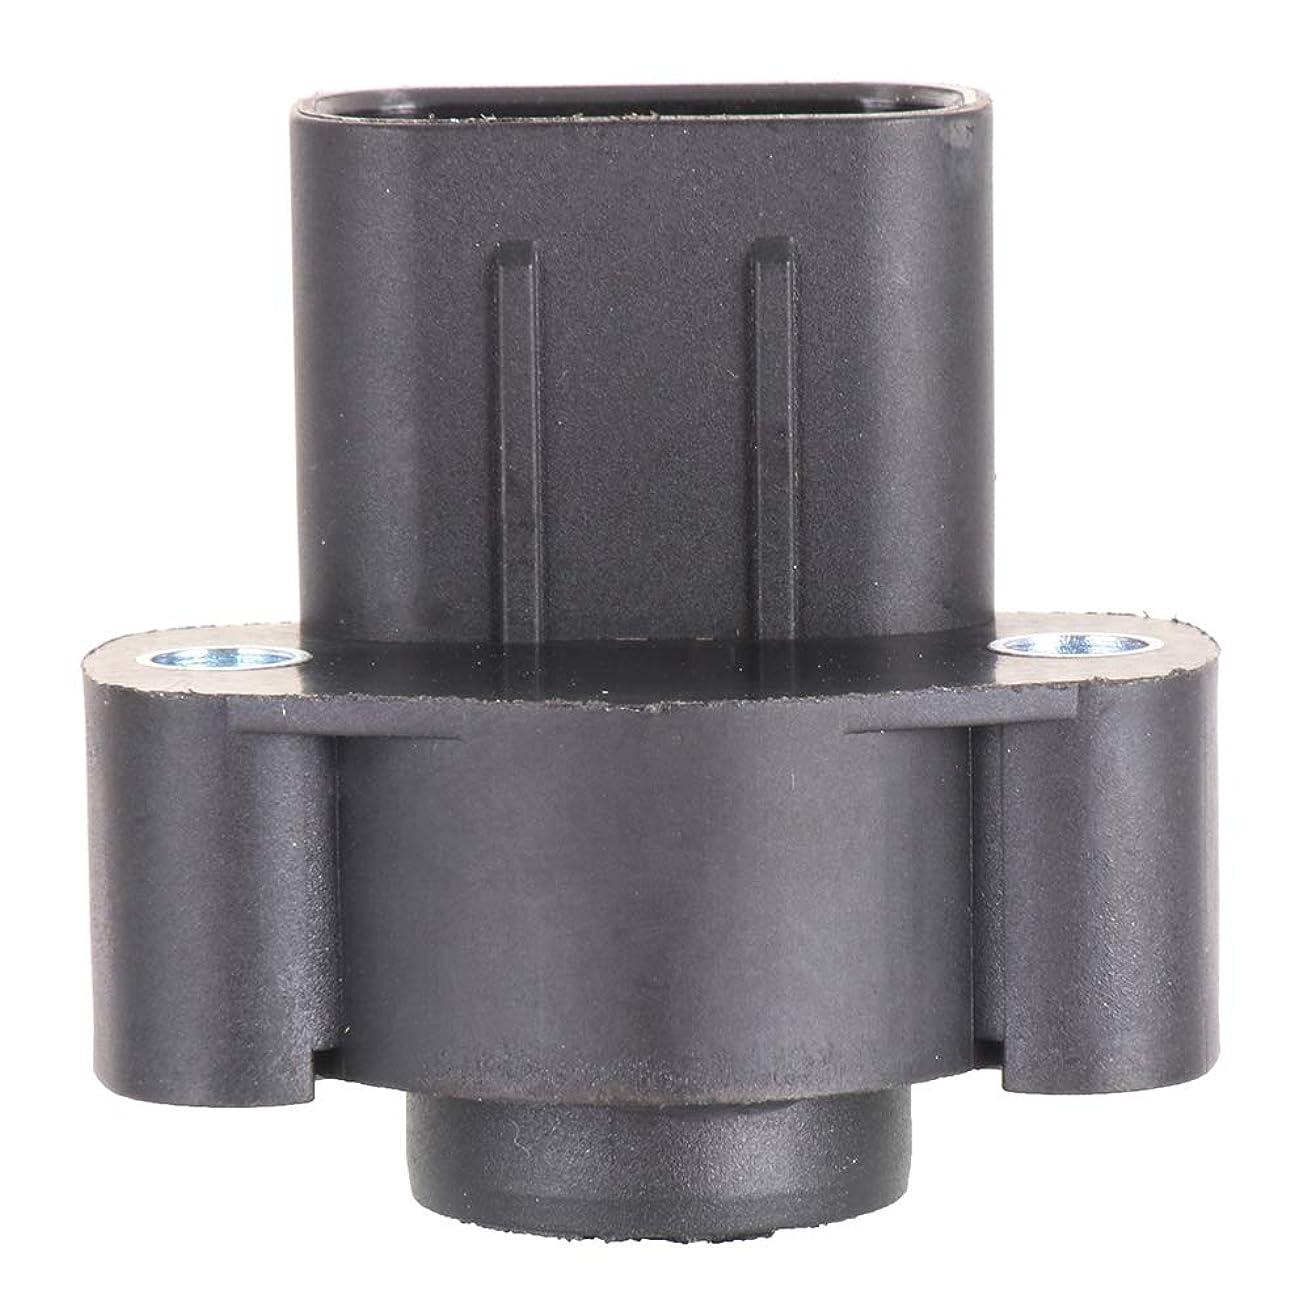 ECCPP Throttle Position Sensor TPS Fit for 1991-1993 Chrysler, 1992-1997 Dodge, 1991-1996 Jeep, 1991-1995 Plymouth 4626051 5234903 Automotive Replacement Sensor